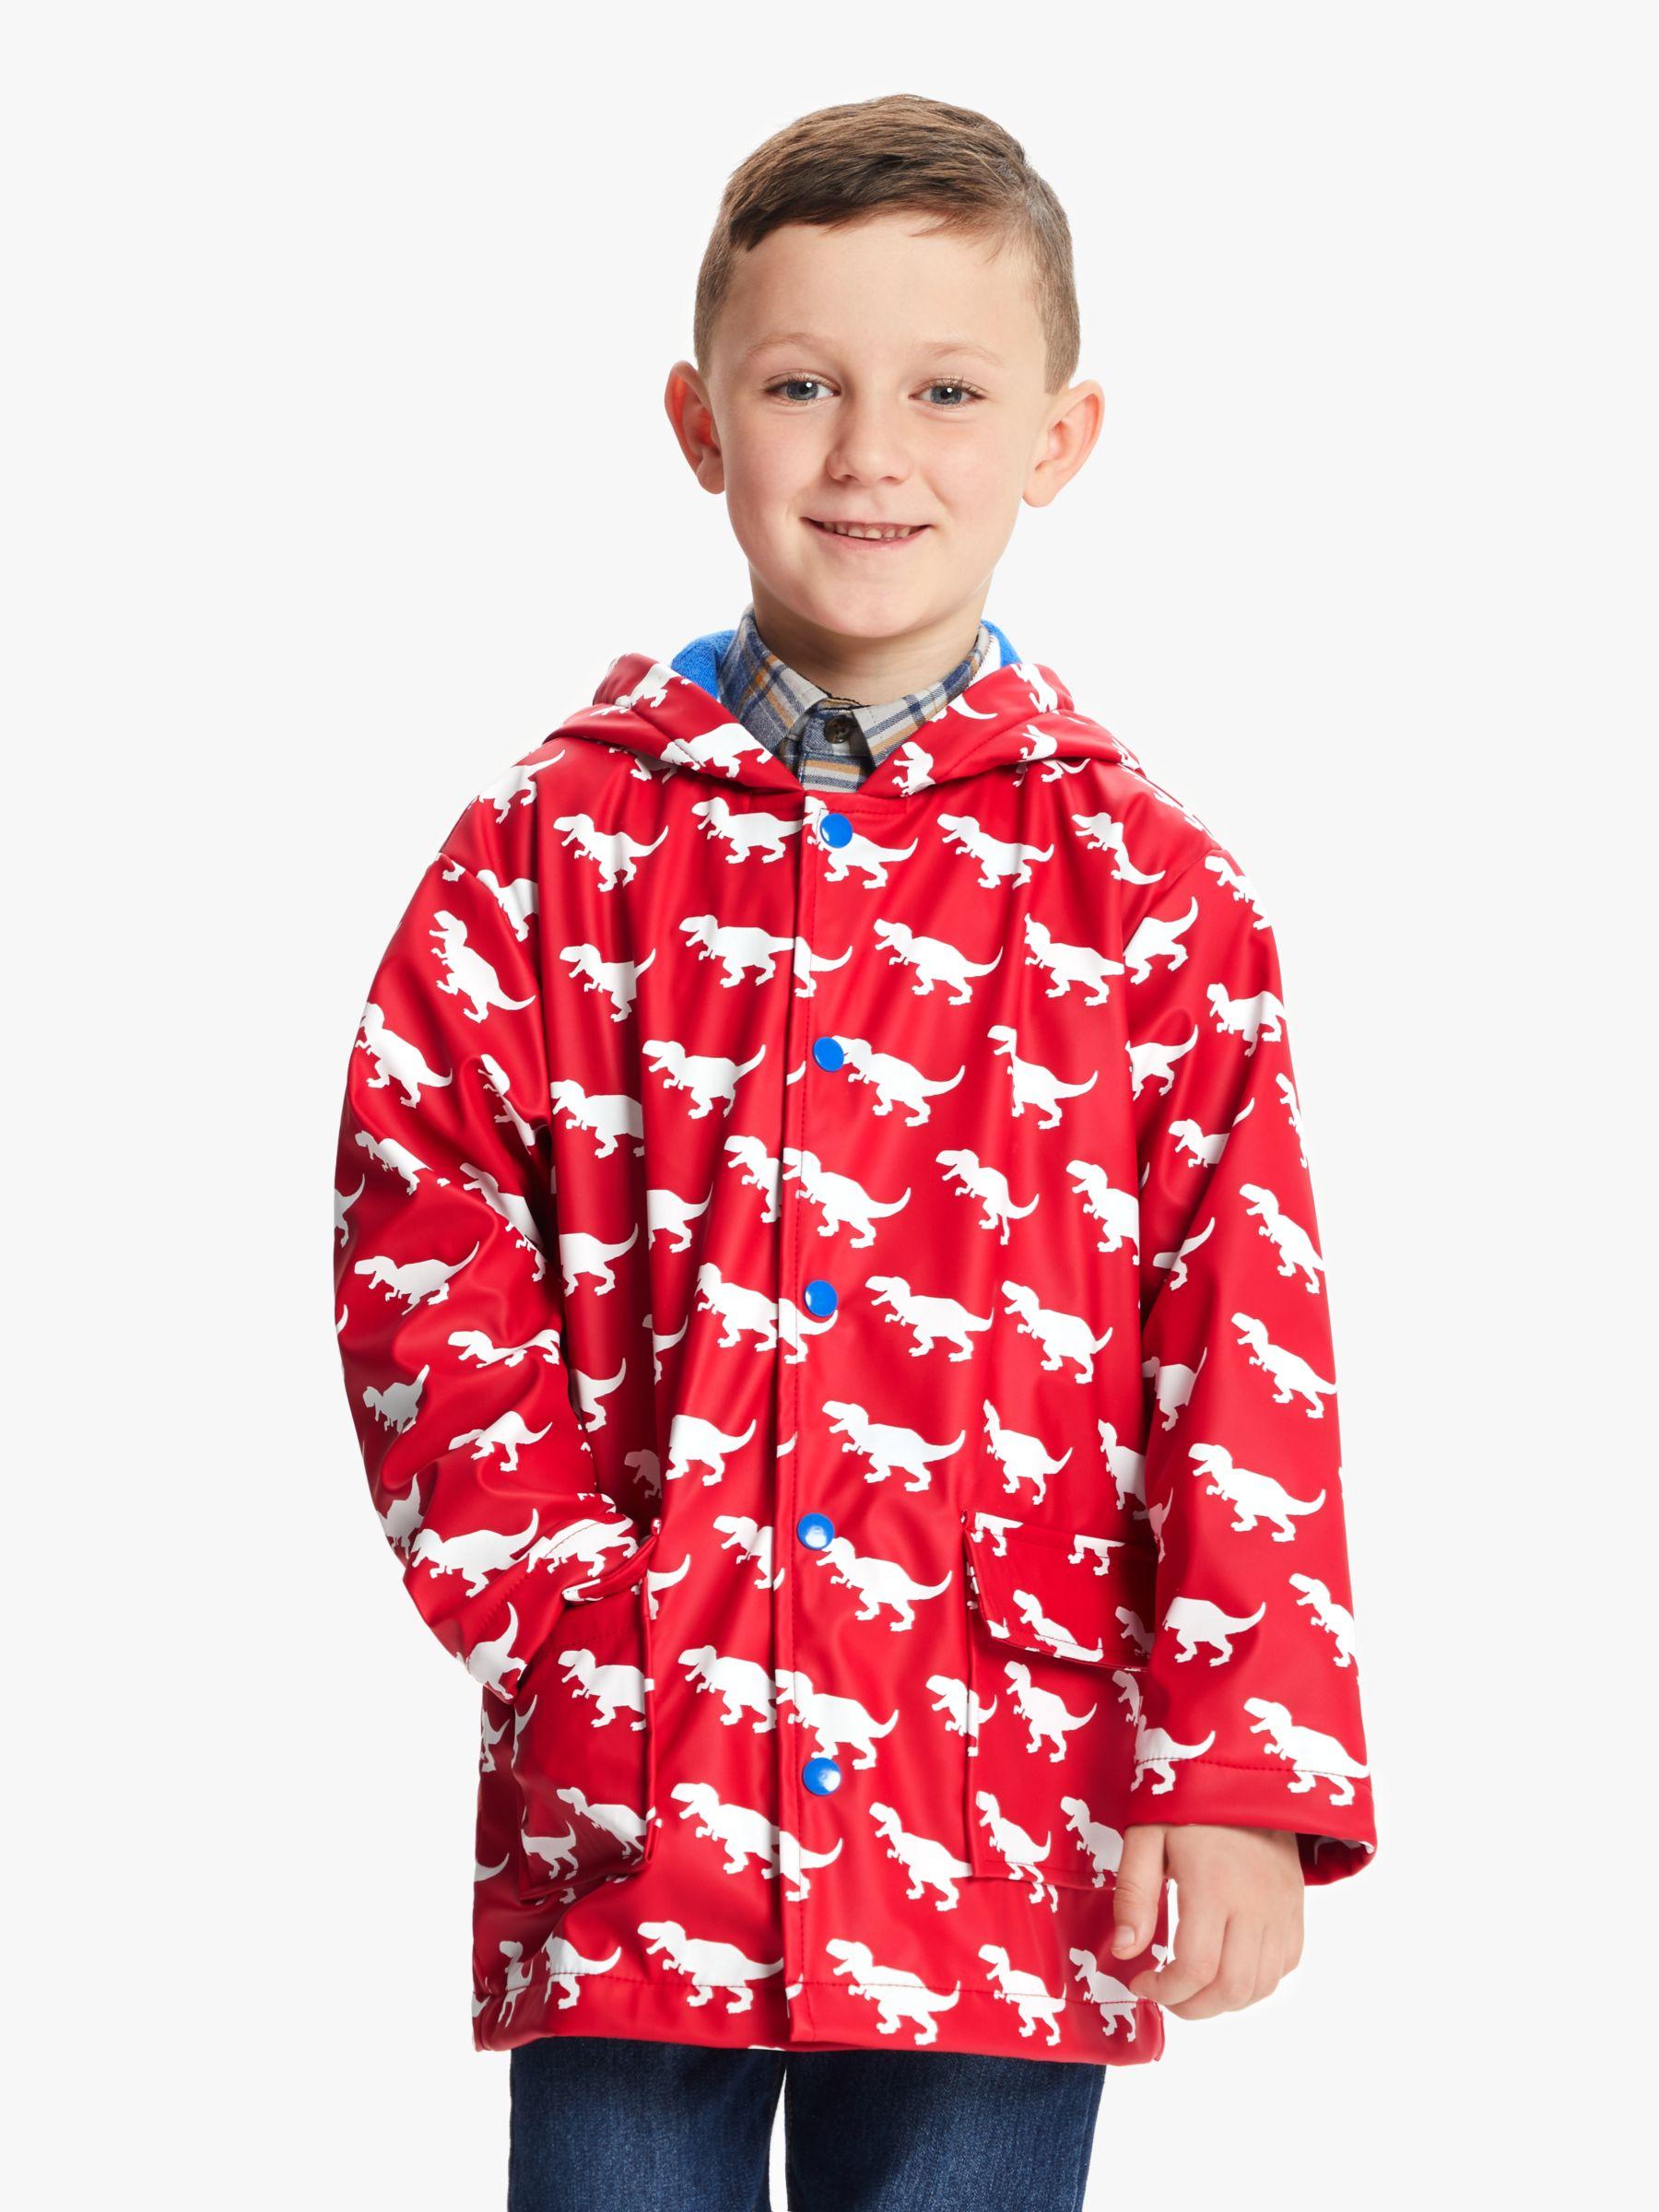 Hatley Hatley Boys' T-Rex Print Raincoat, Red